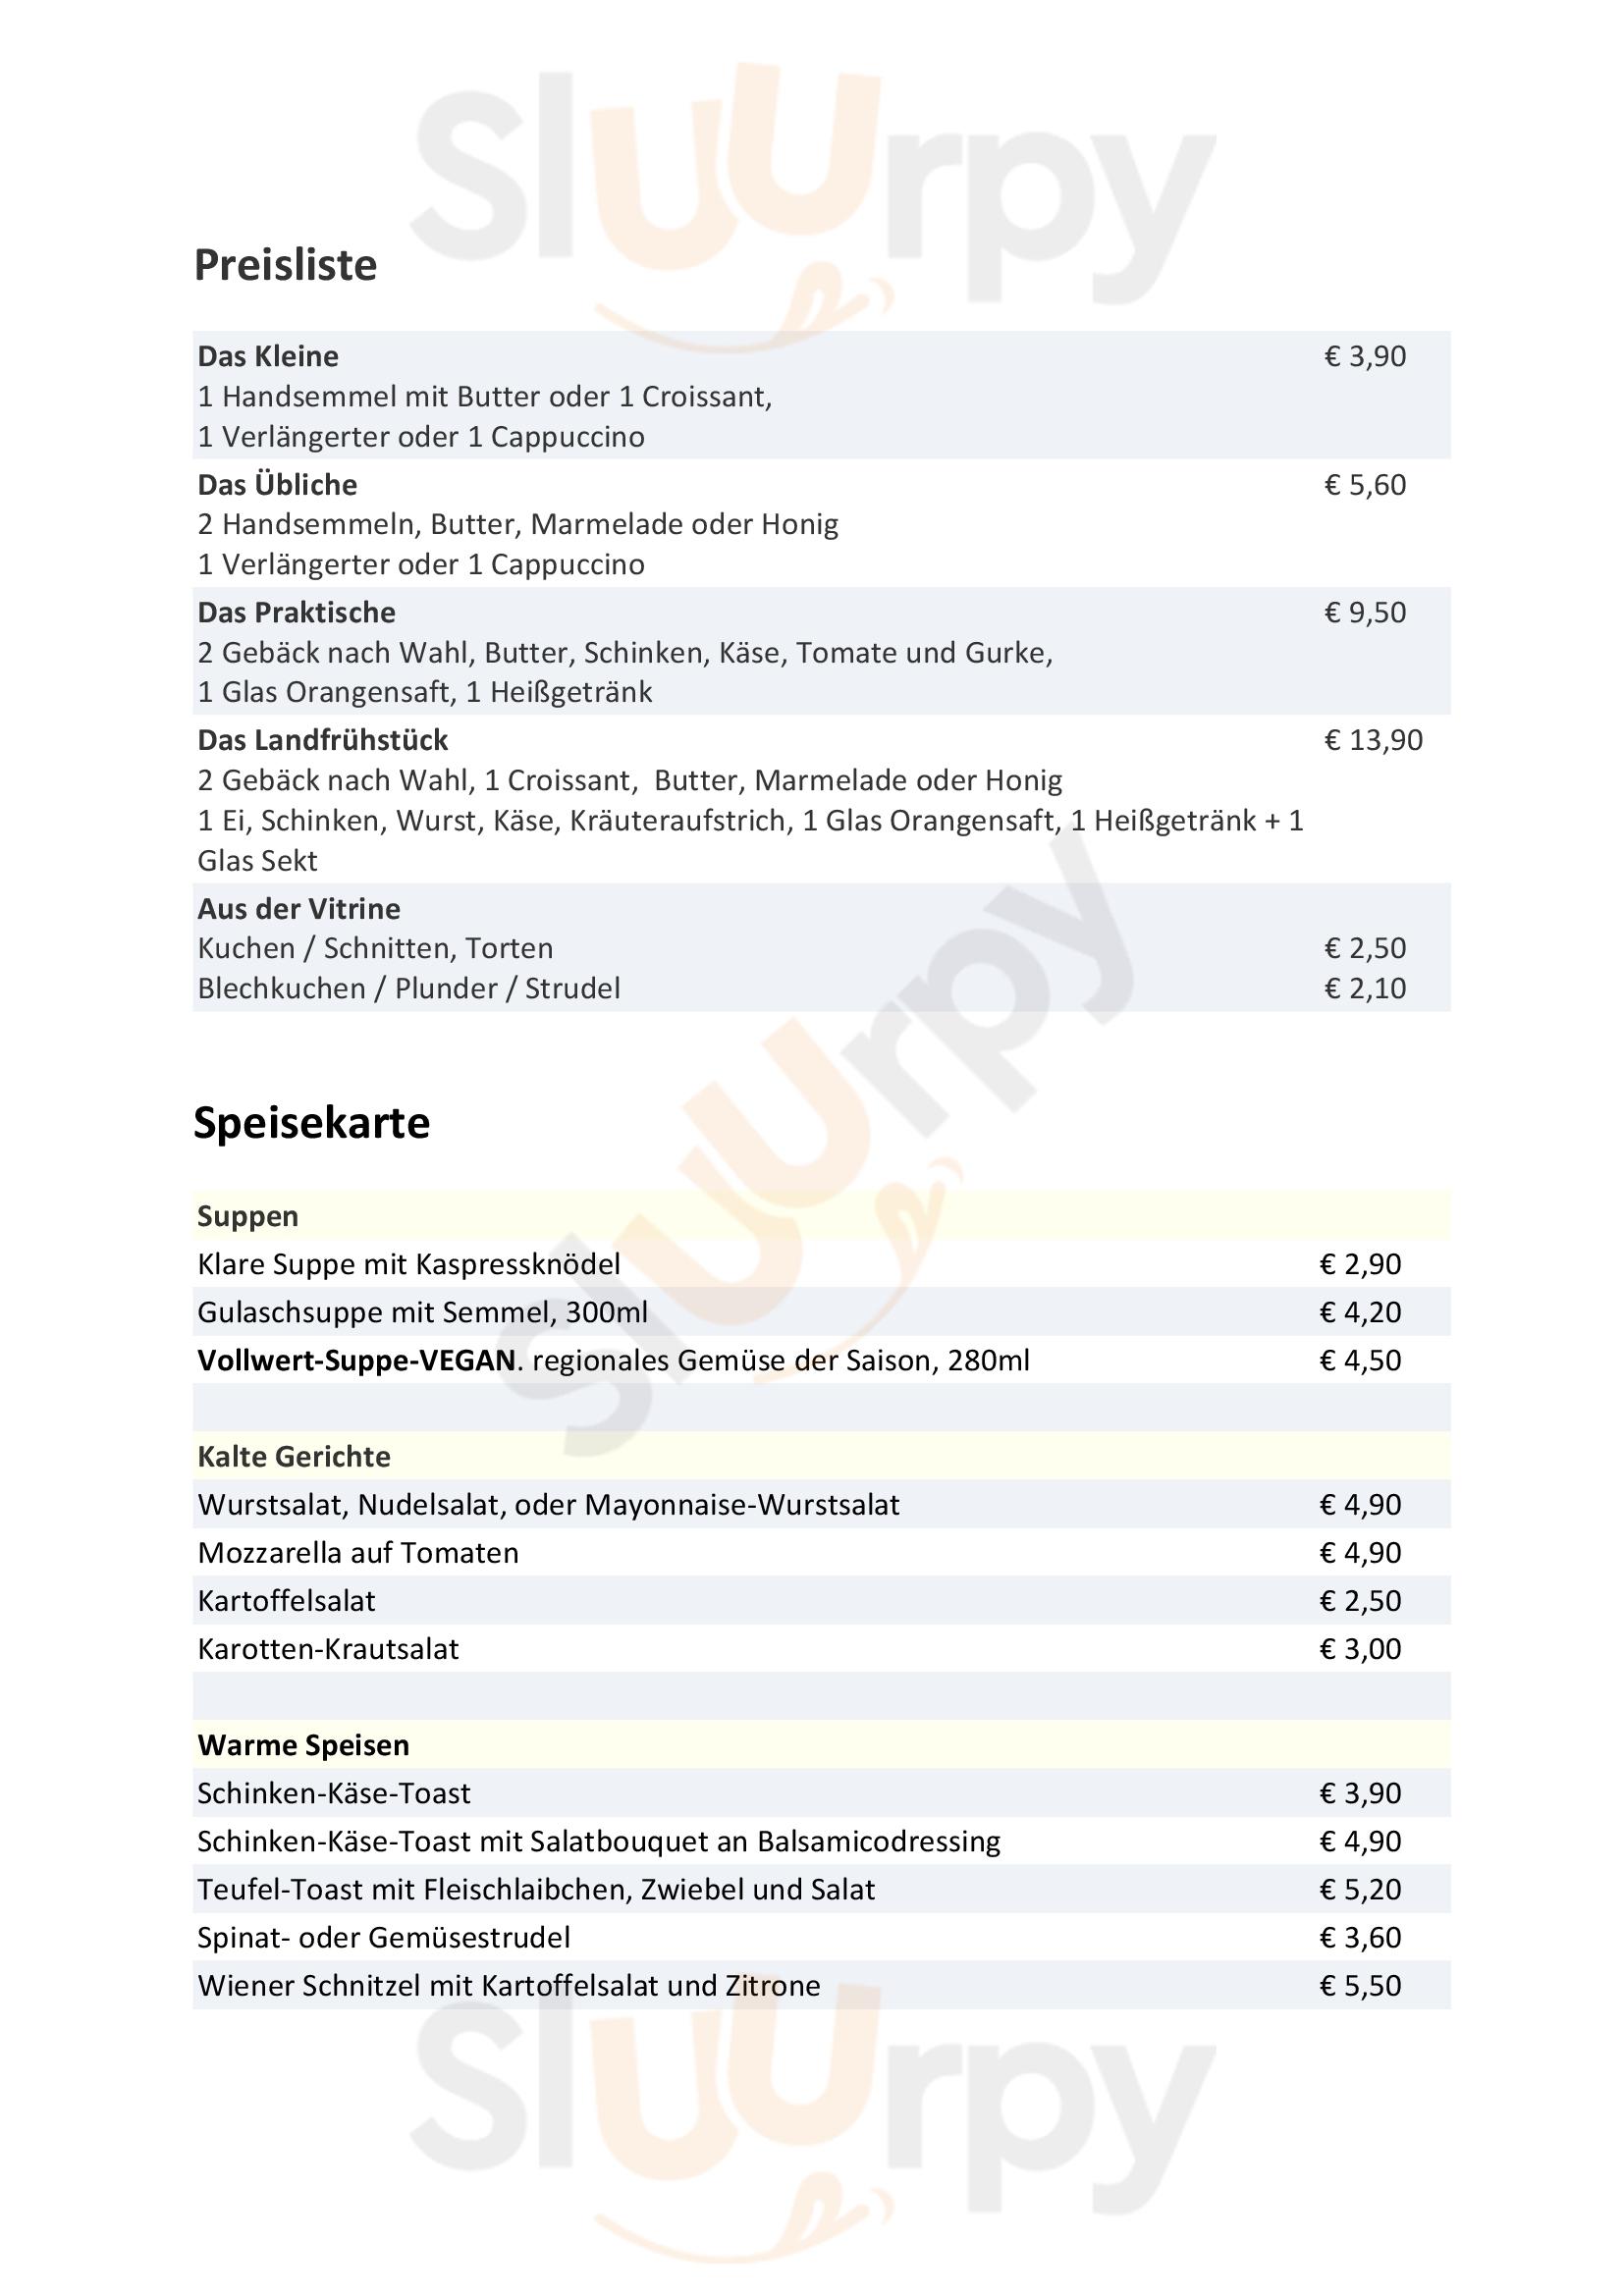 Elixhausener Landbäckerei Salzburg Menu - 1